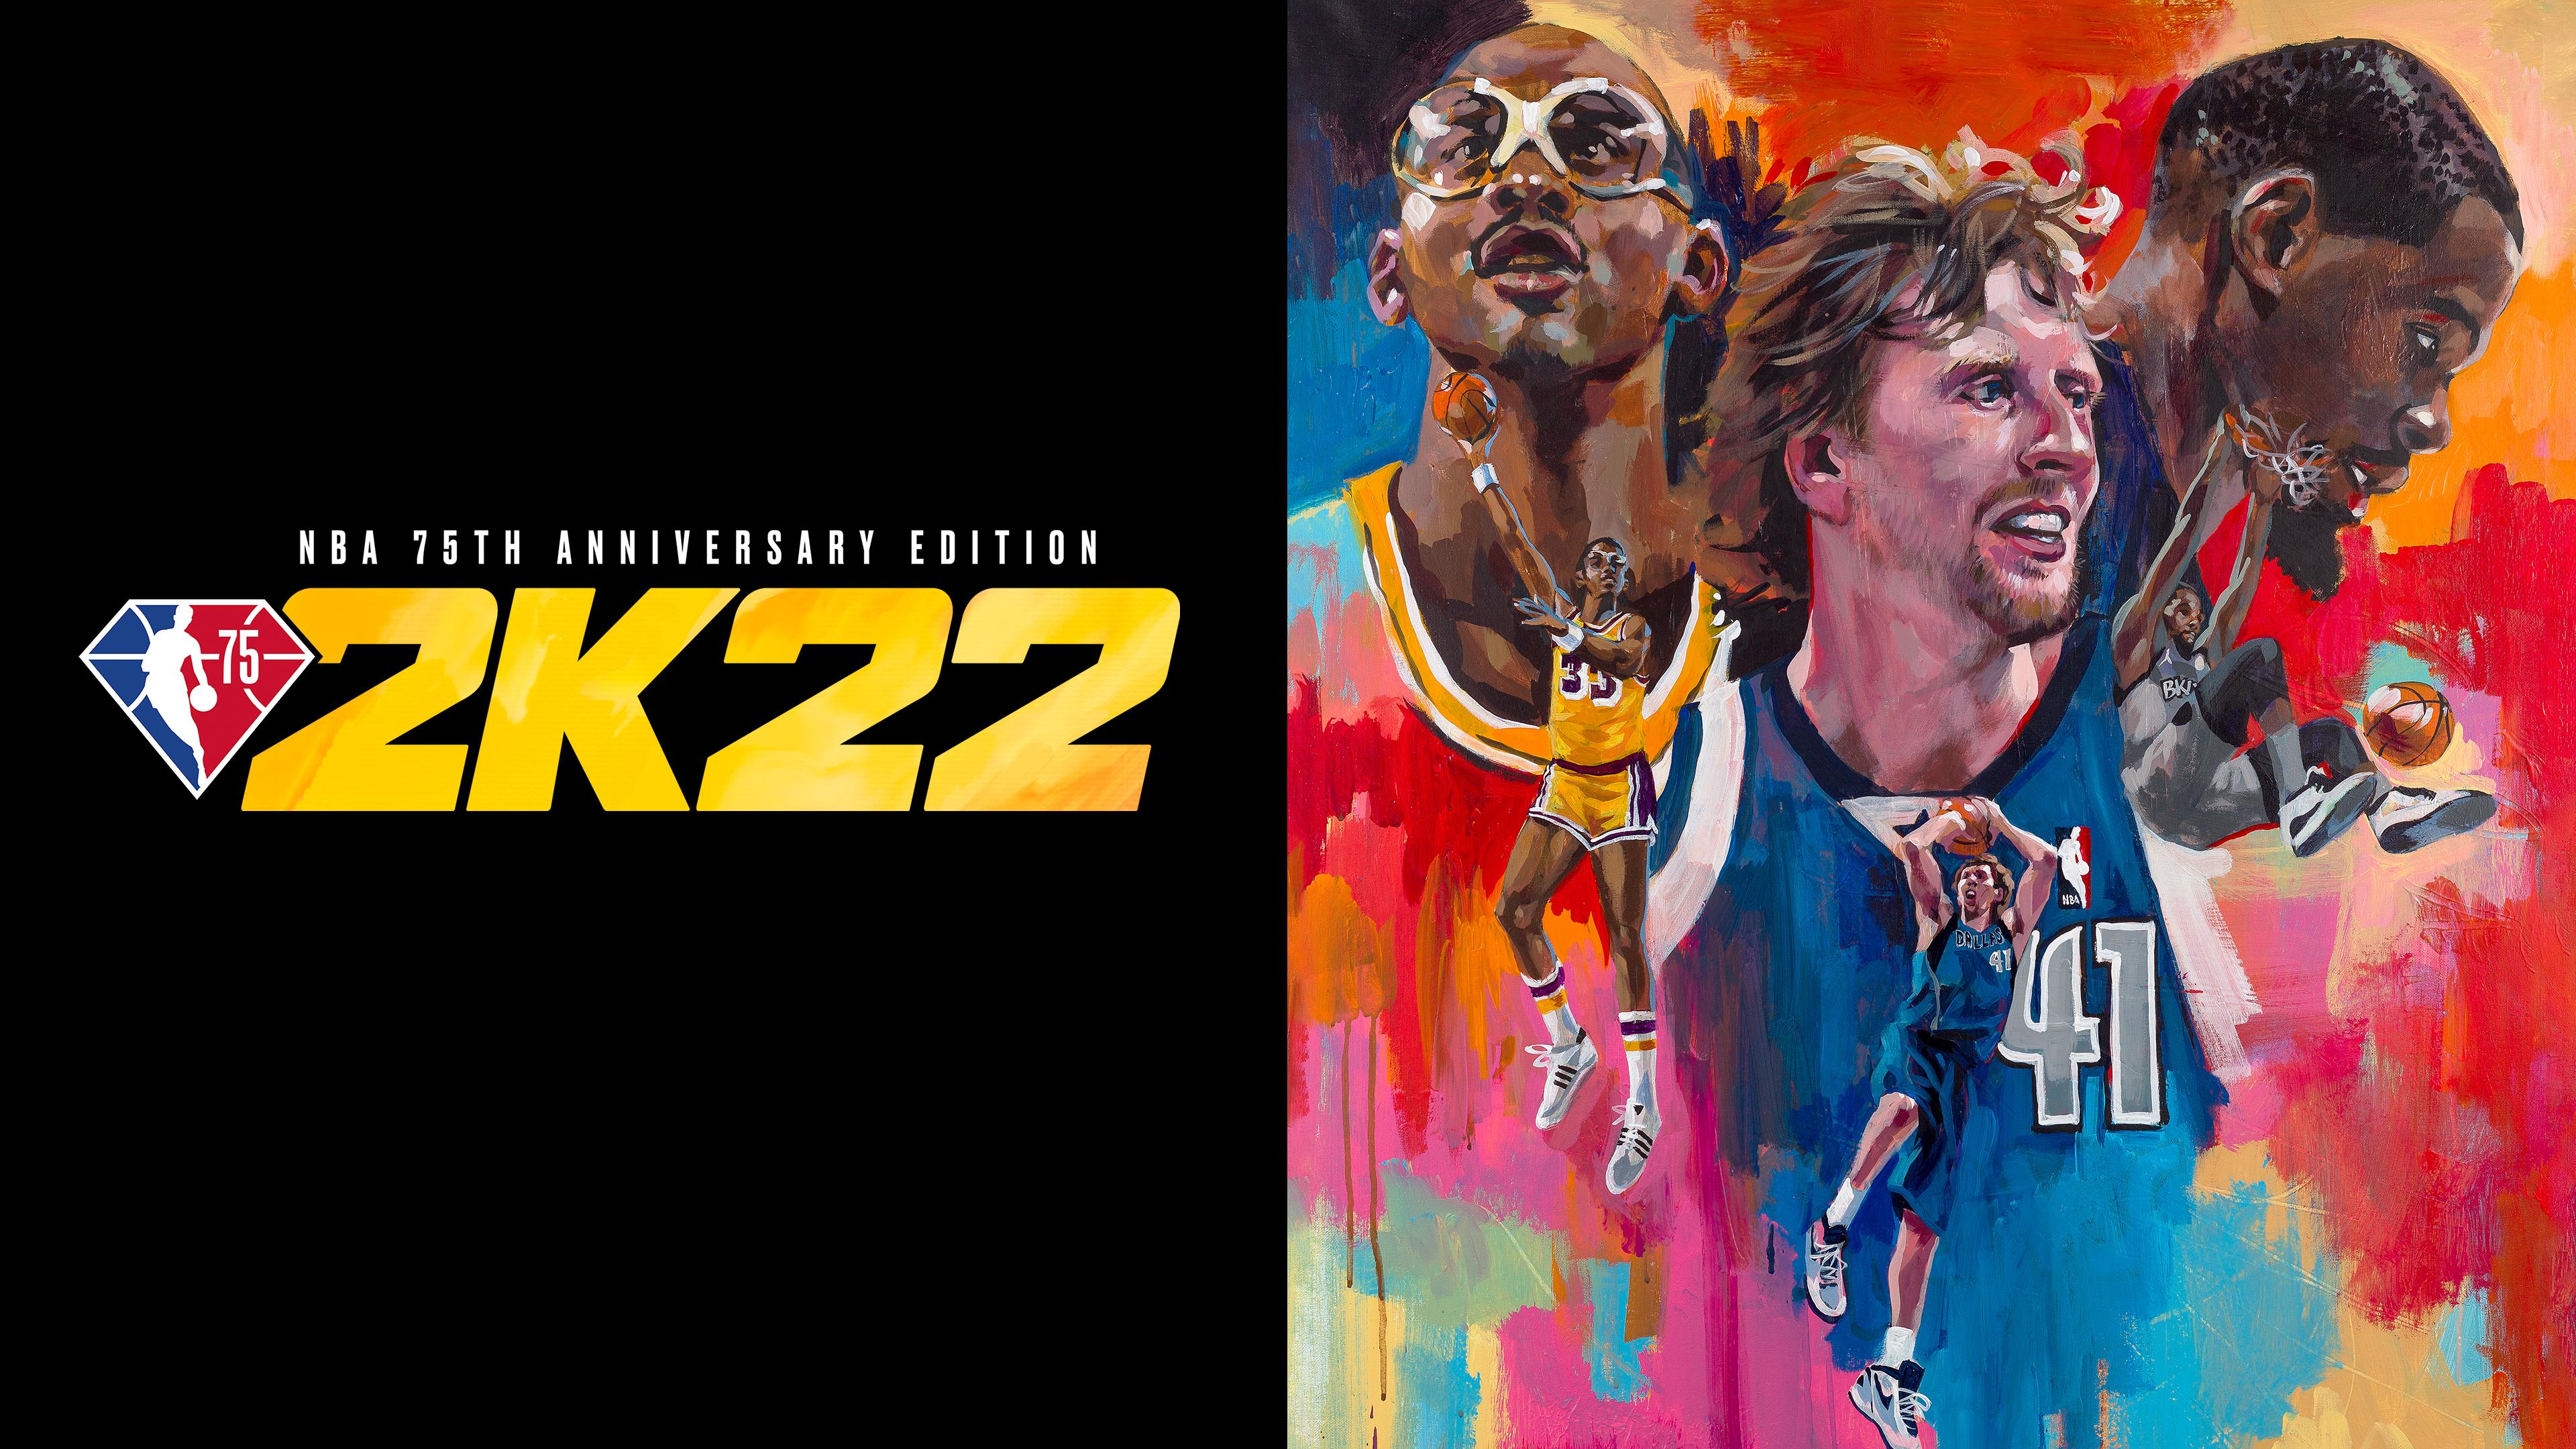 Скриншот №1 к Предзаказ NBA 2K22 NBA 75th Anniversary Edition для PS4 and PS5